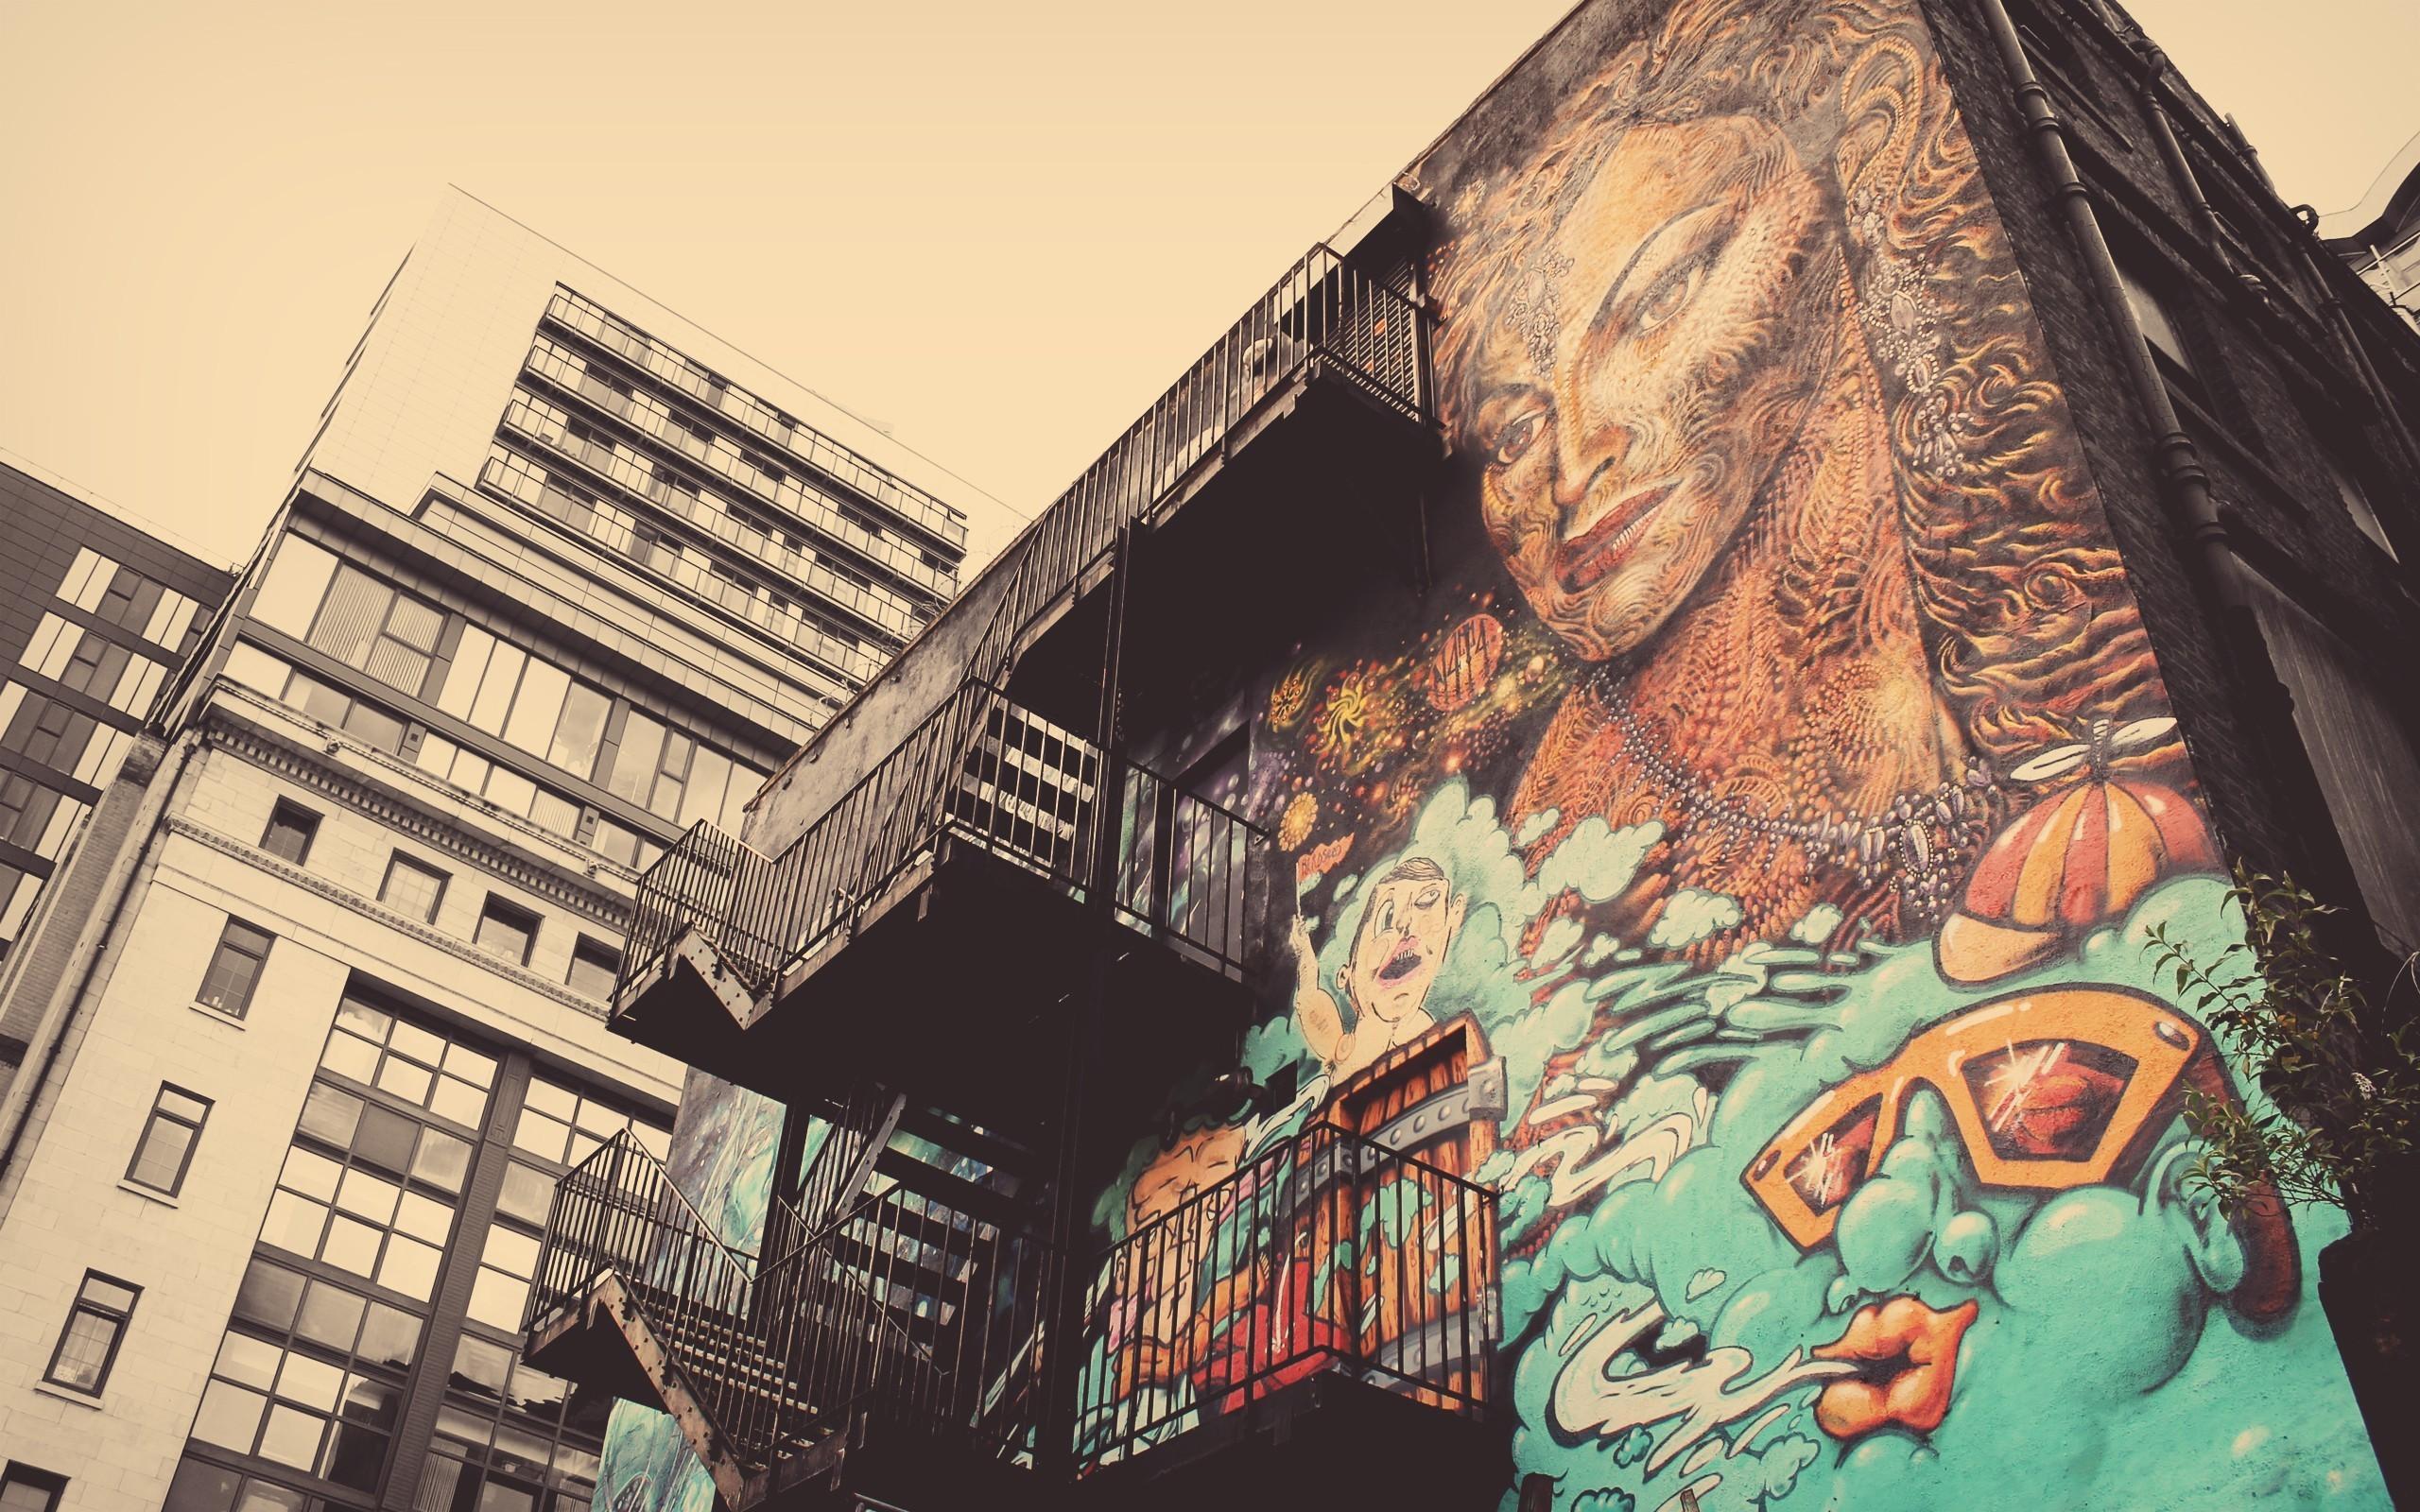 Graffiti art wallpaper - Graffiti Art On The High Rise Building